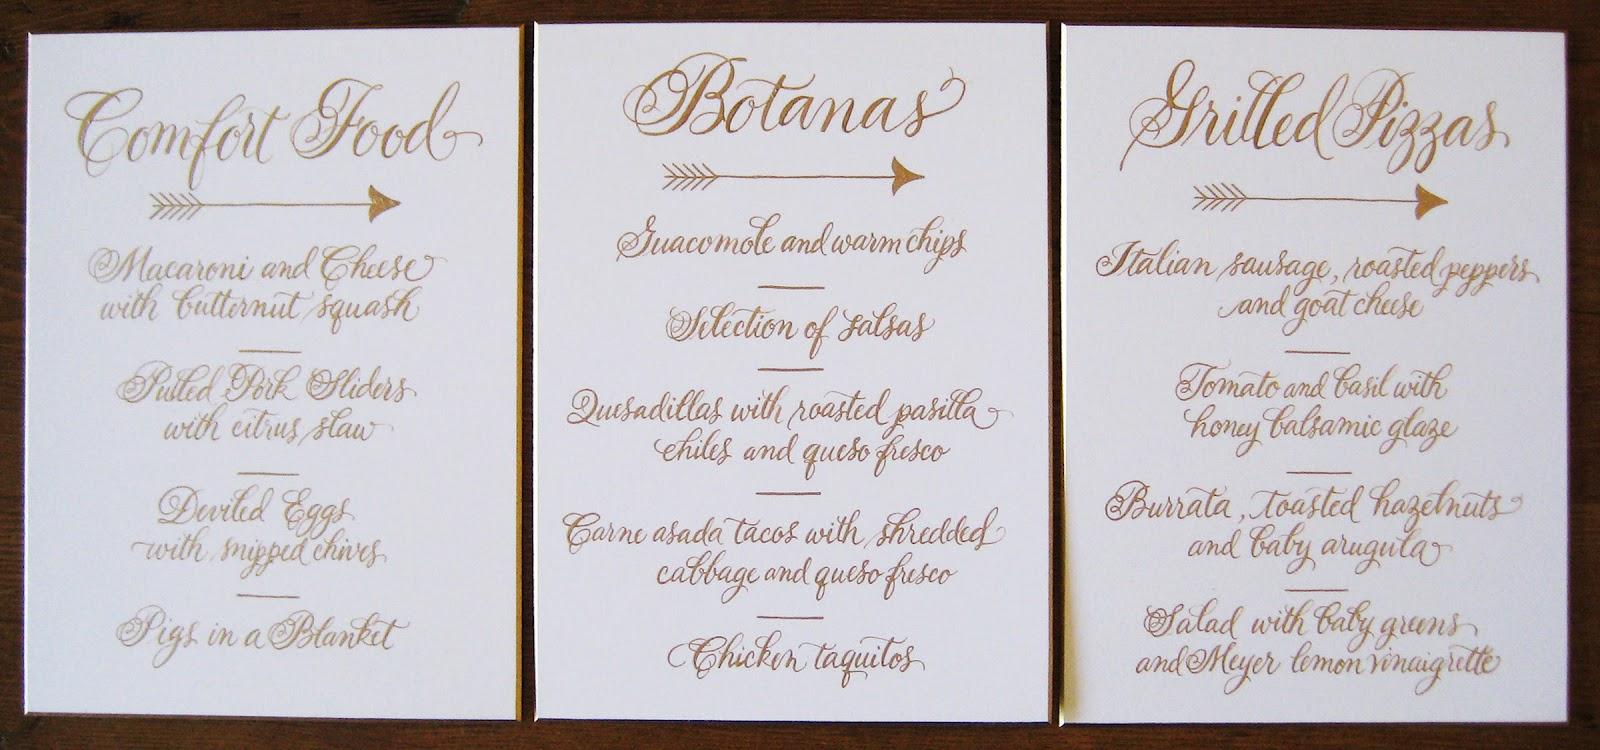 A to z calligraphy wedding menus